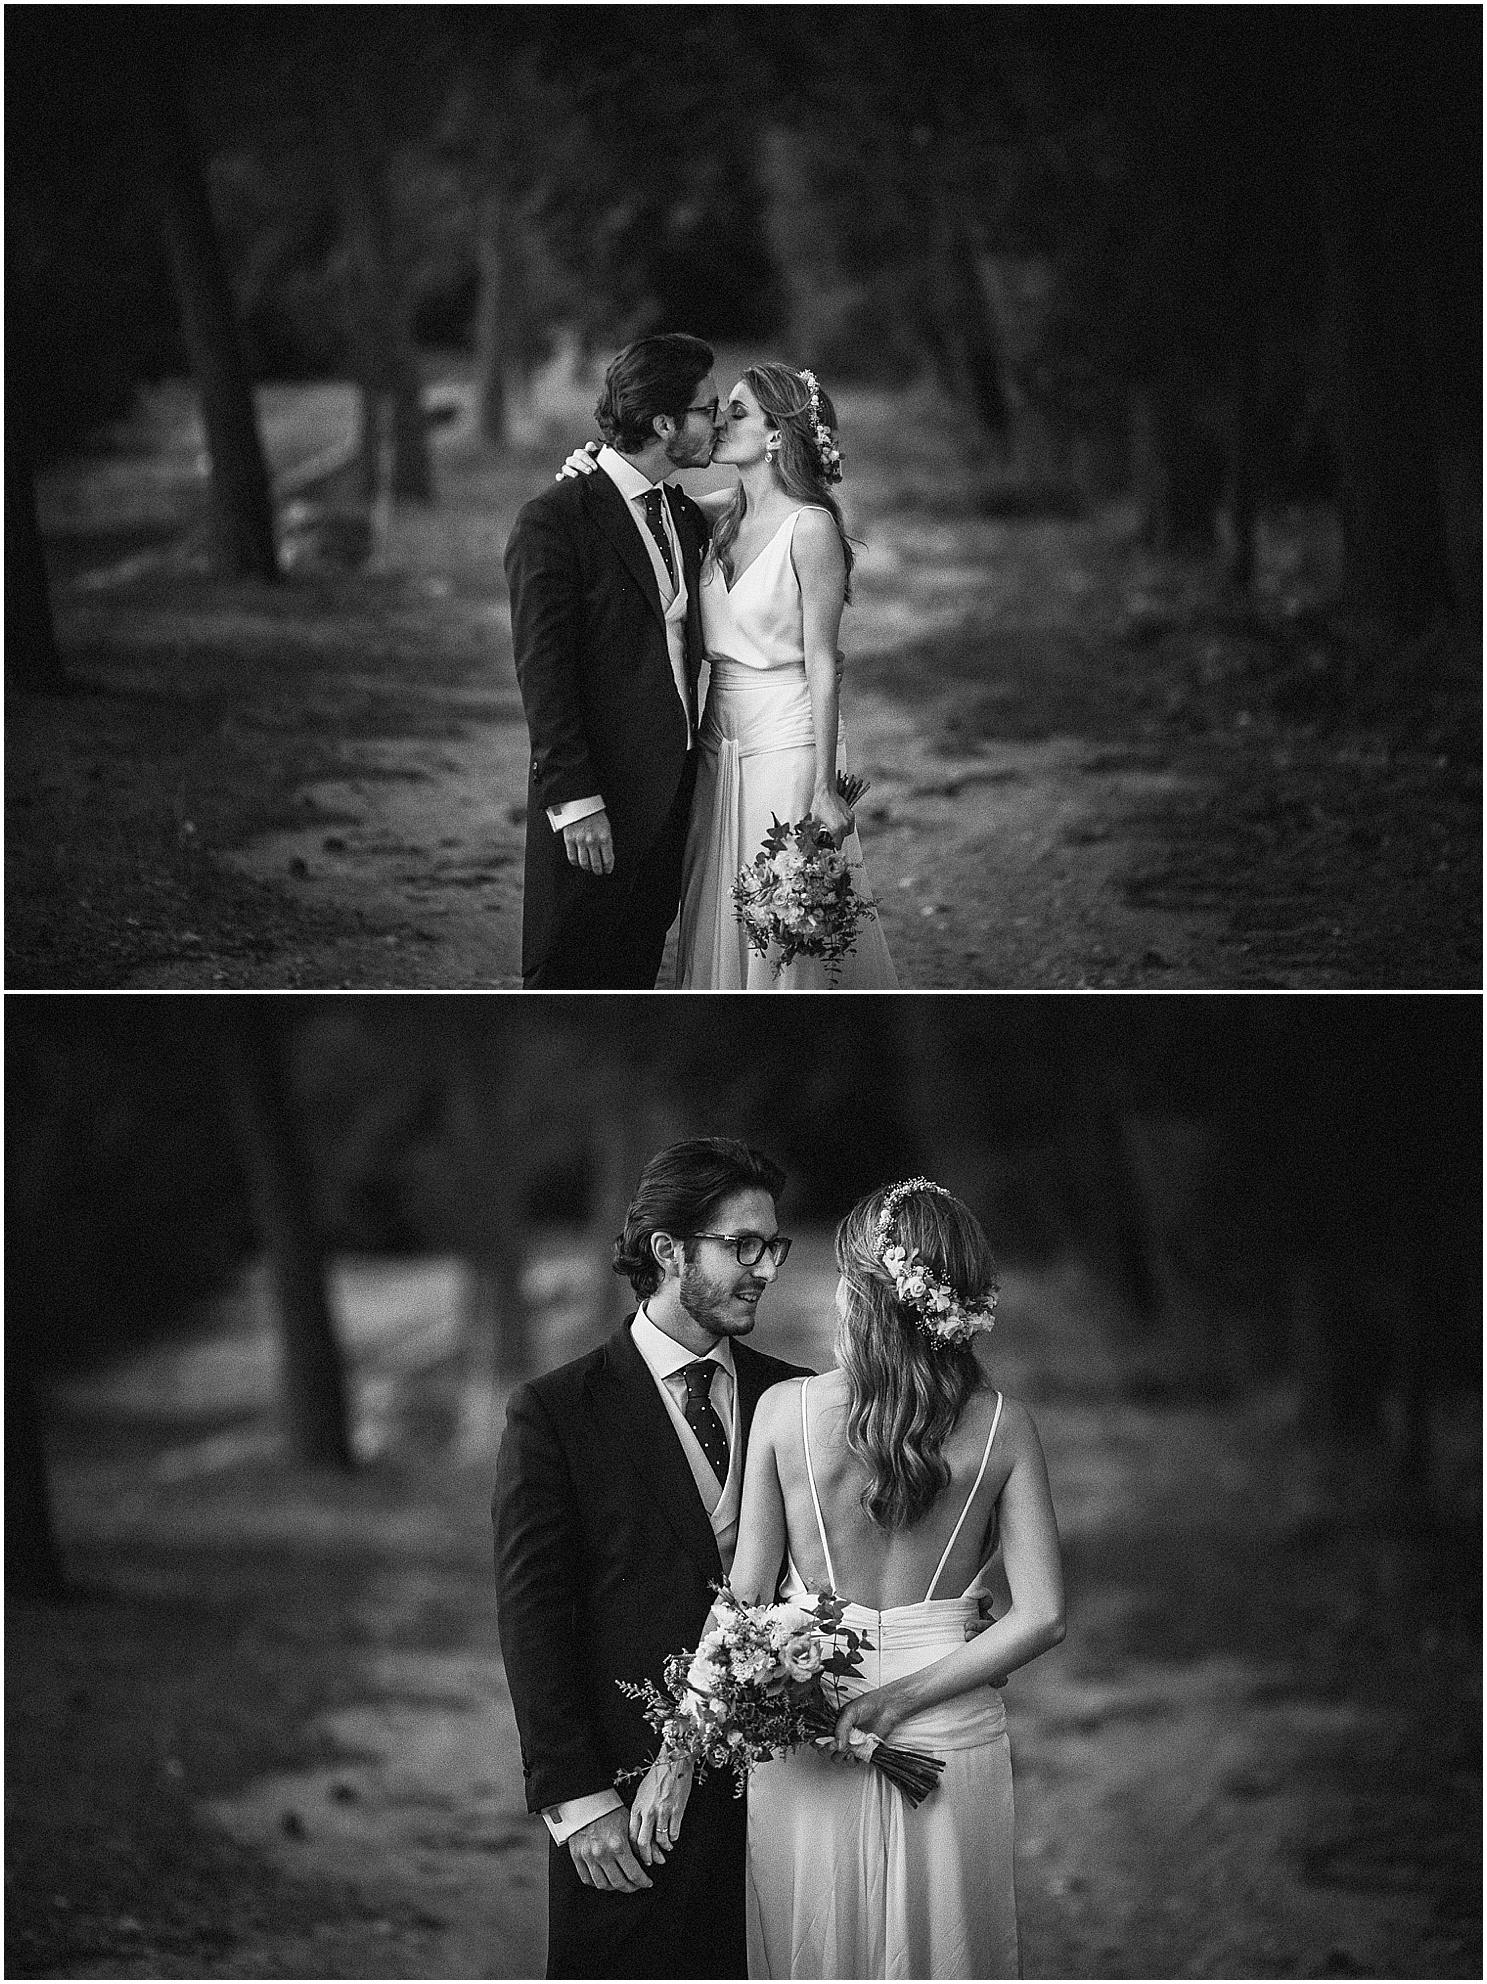 Macarena y Jordi - boda en valencia - Pablo Laguia (25).jpg